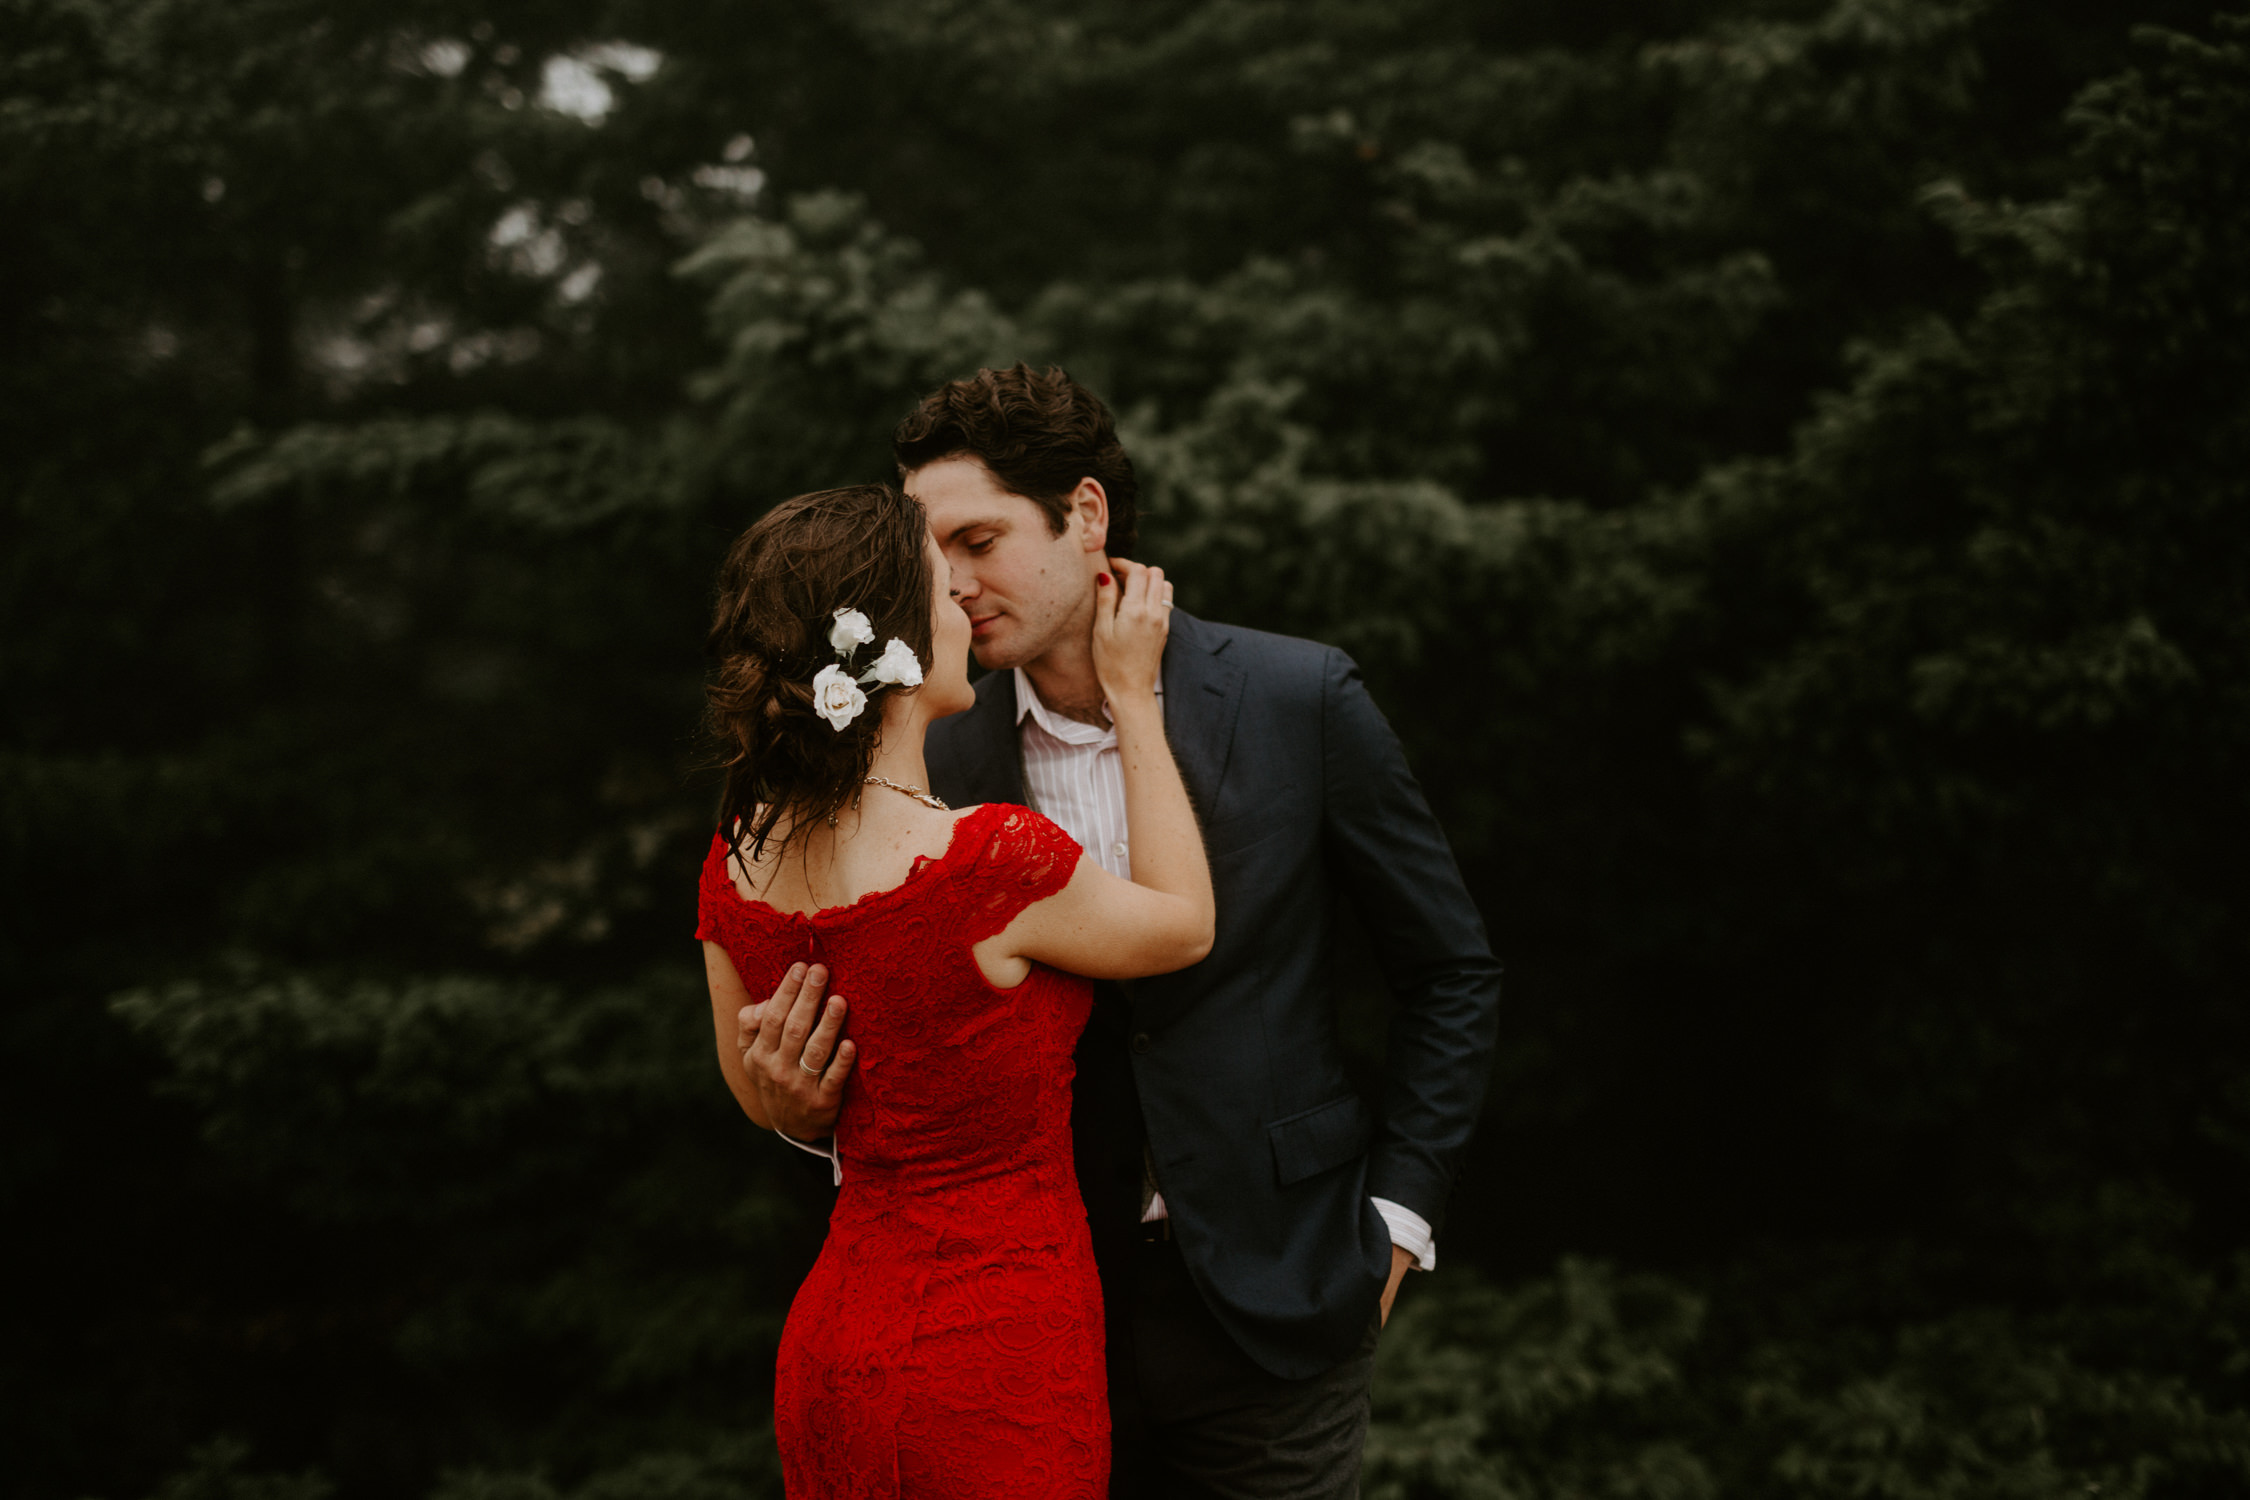 couple-intimate-engagement-session-mt-tam-19.jpg